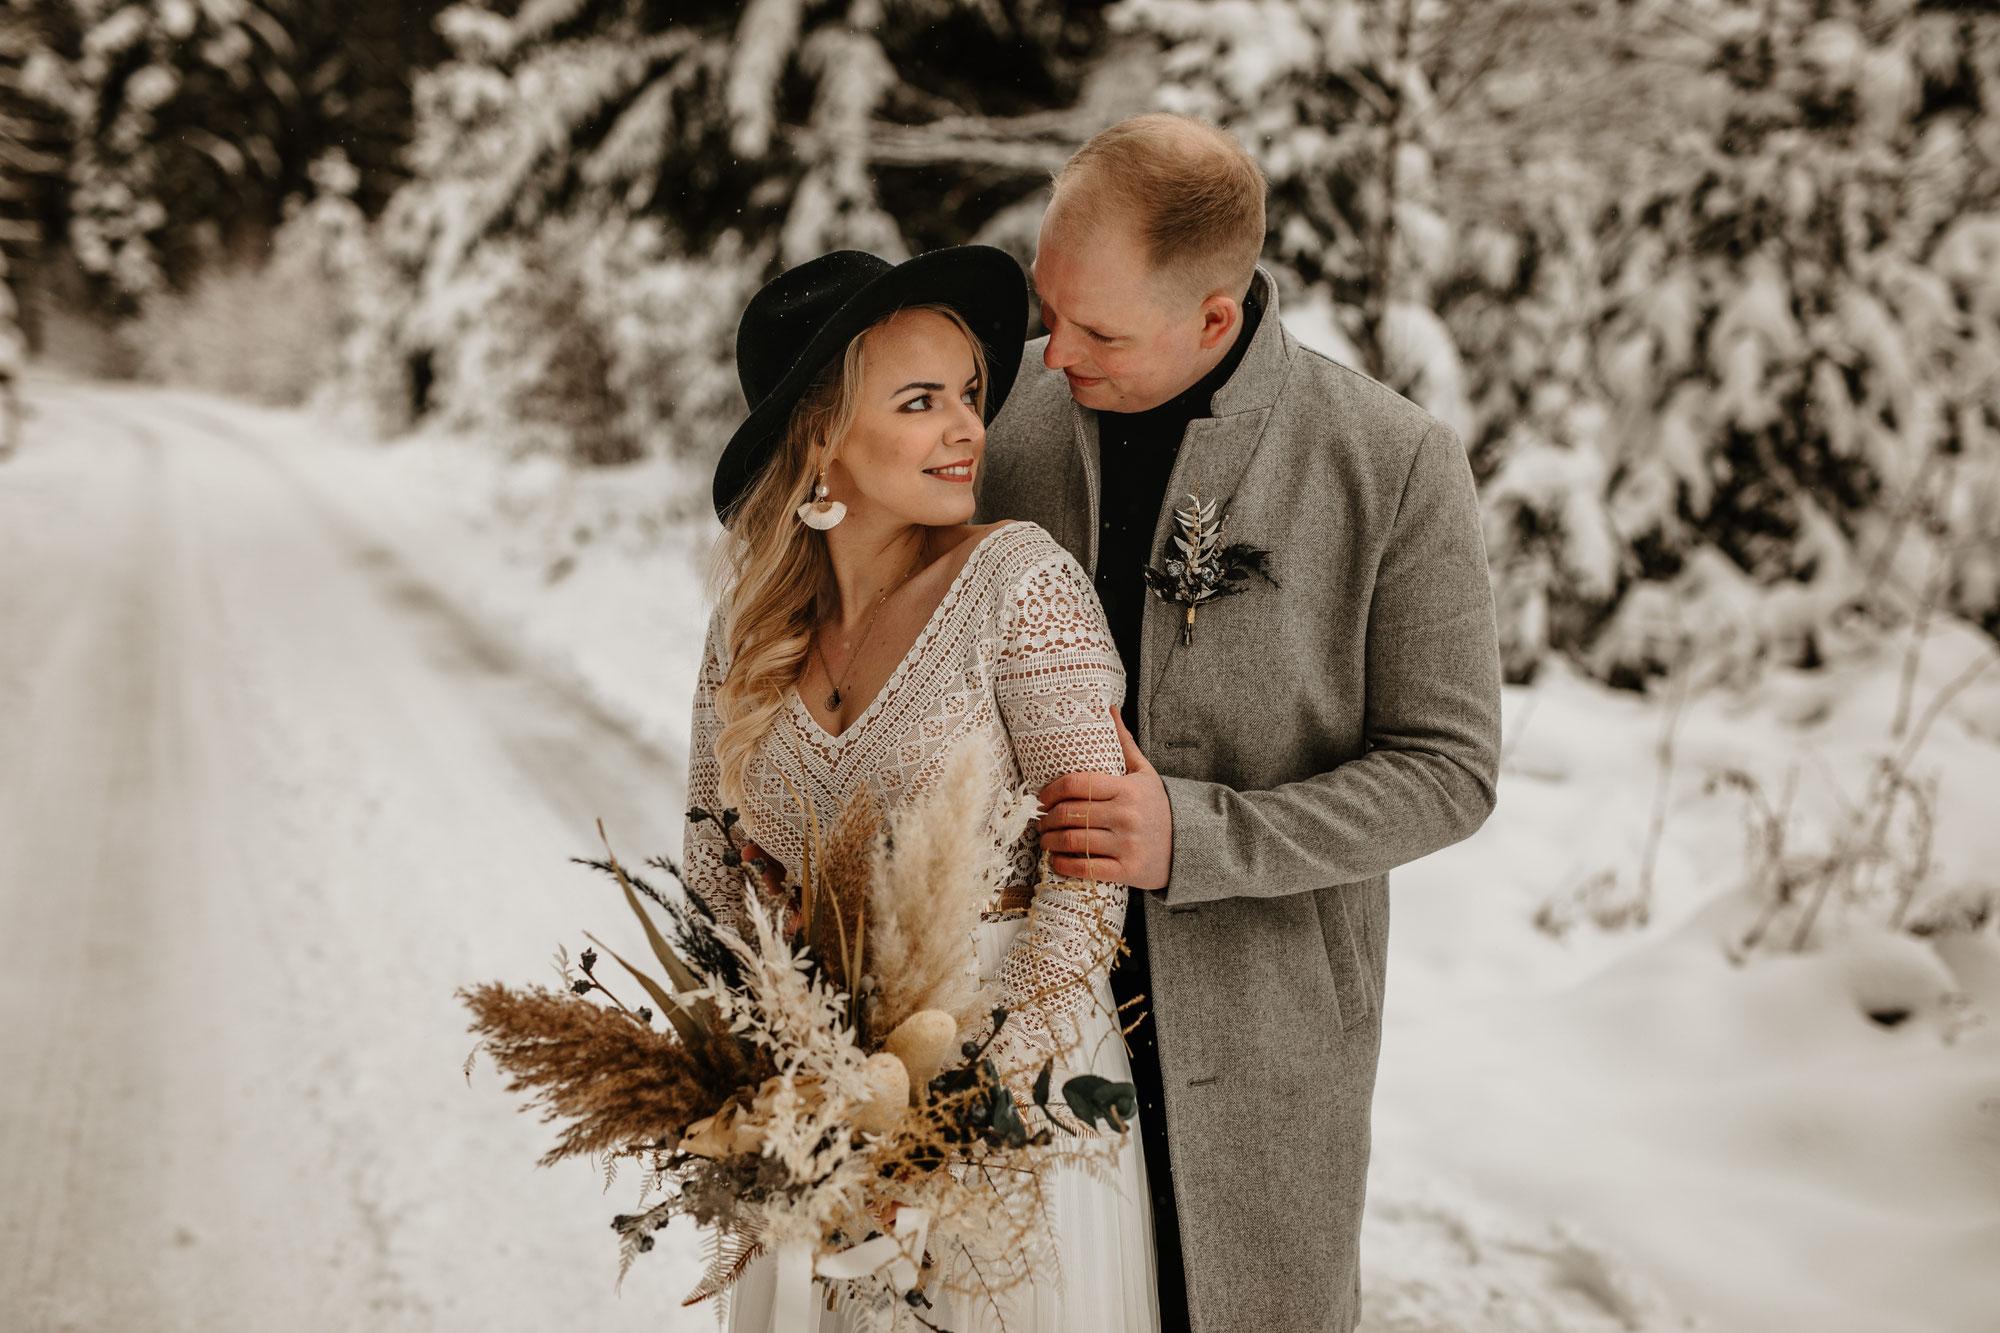 Boho-Winterwedding // Inspirationsshooting